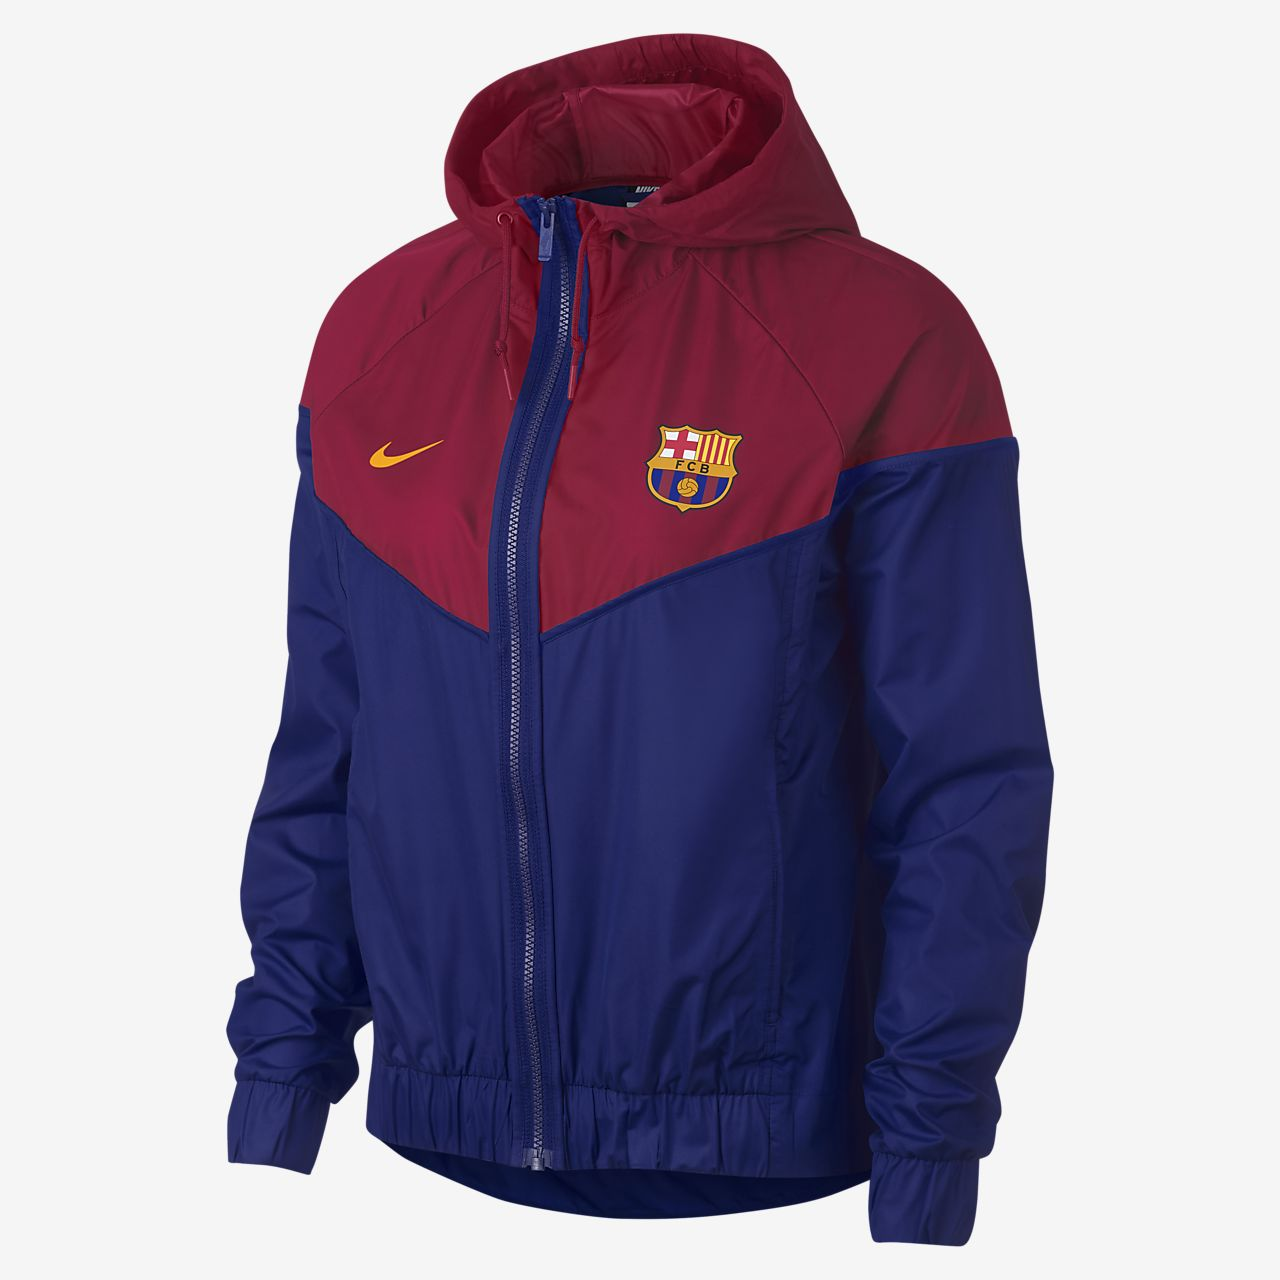 5d0a8cd858 FC Barcelona Windrunner Women s Jacket. Nike.com AU